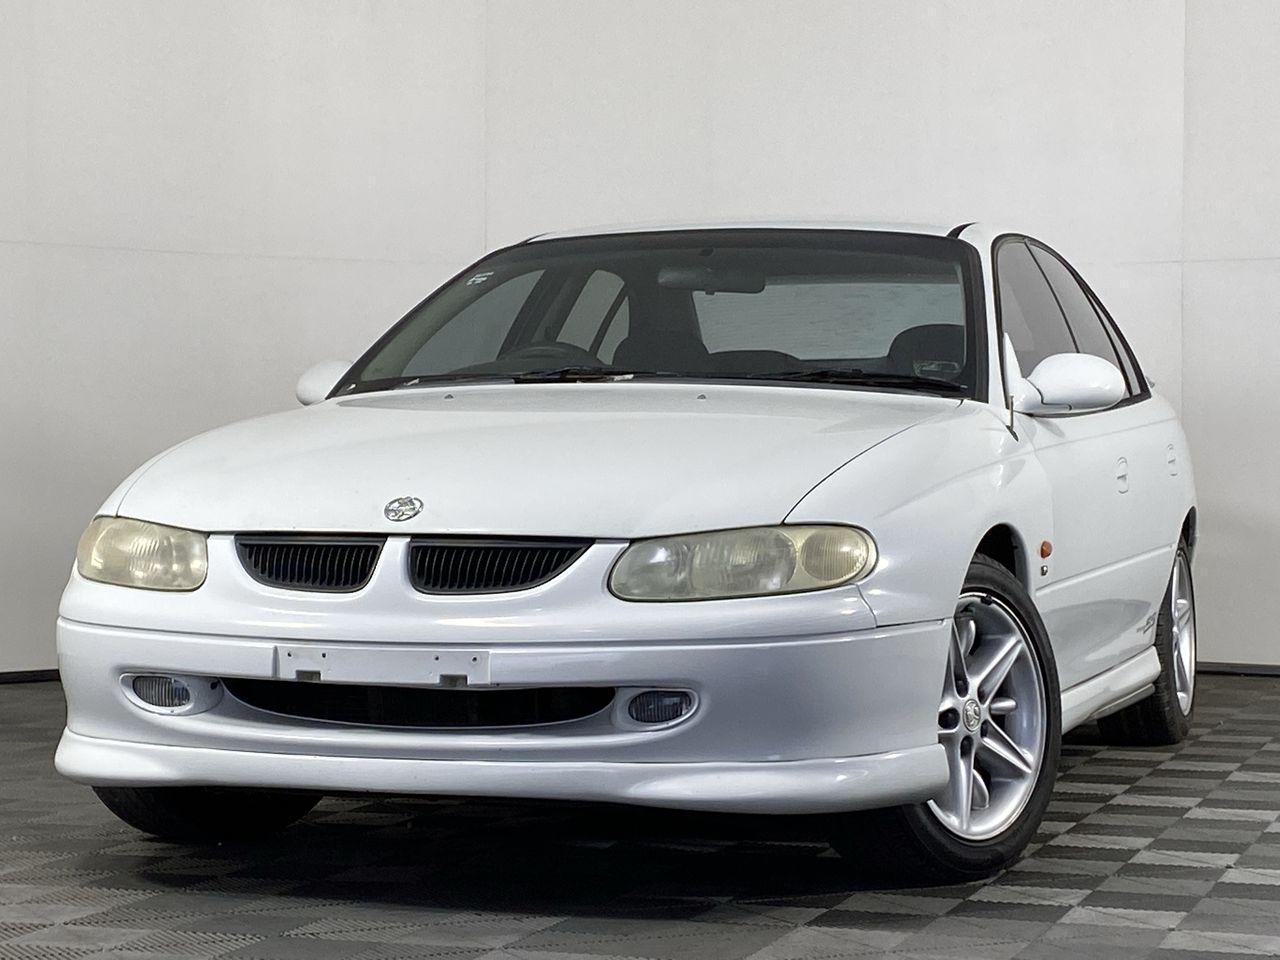 1998 Holden Commodore SS VT Automatic Sedan